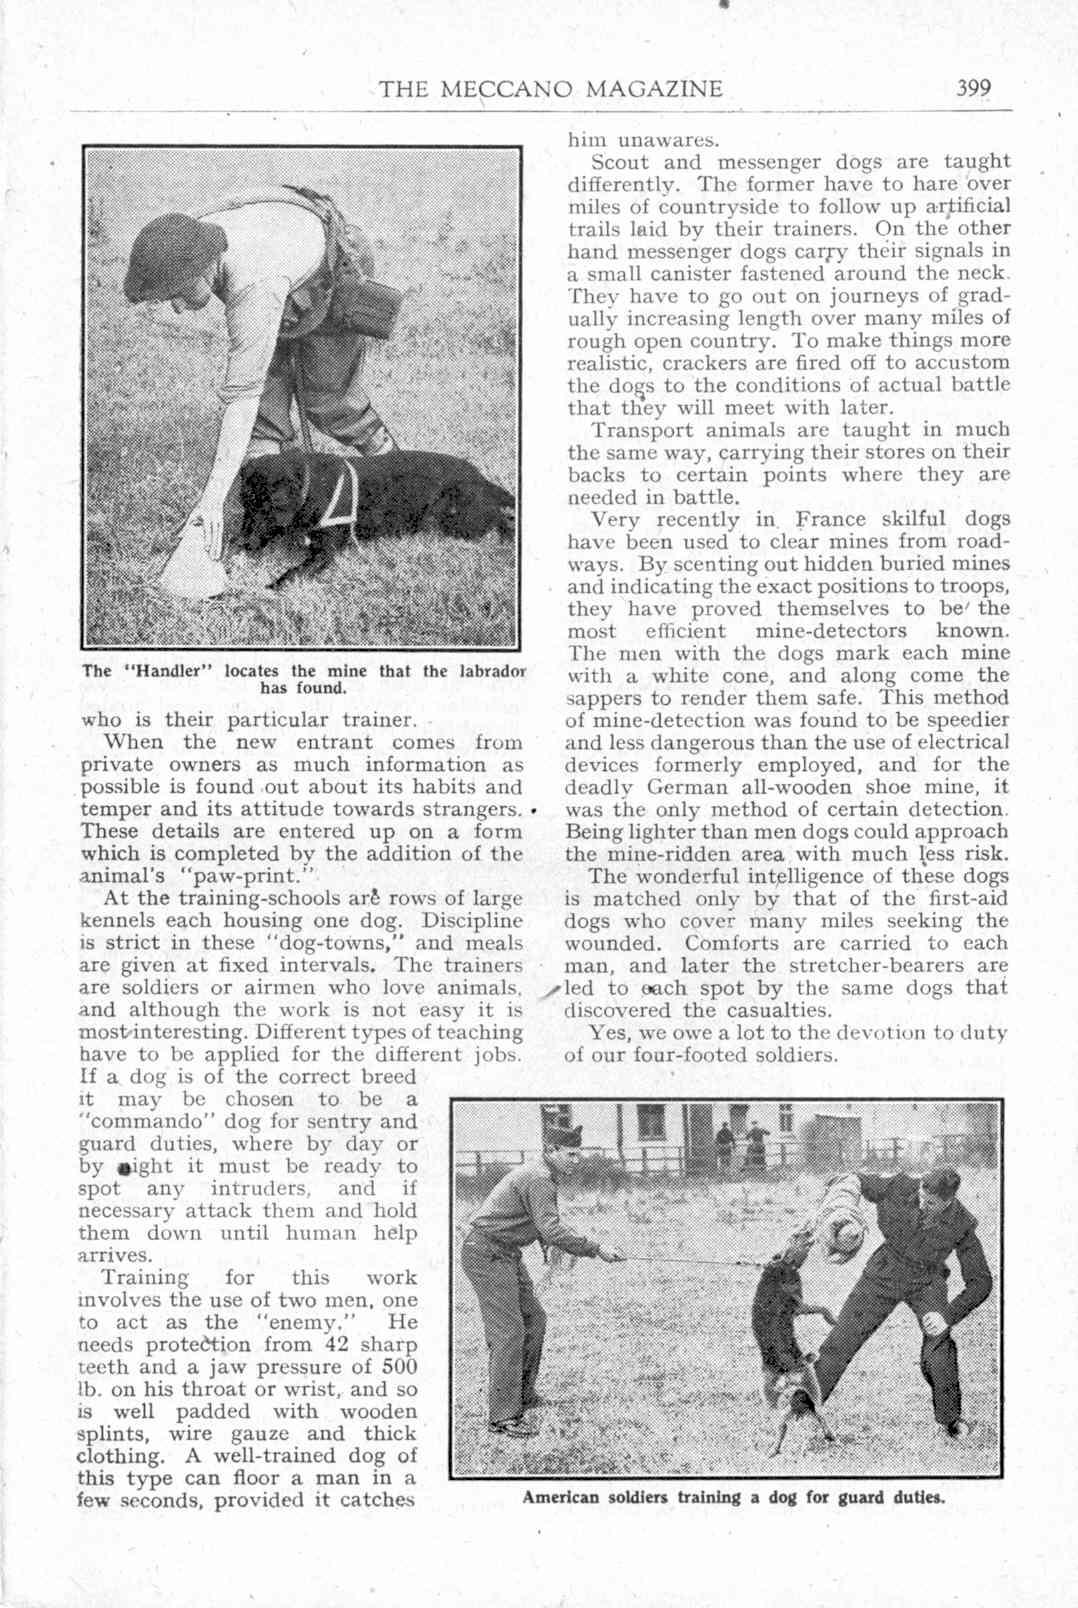 UK Meccano Magazine December 1944 Page 399